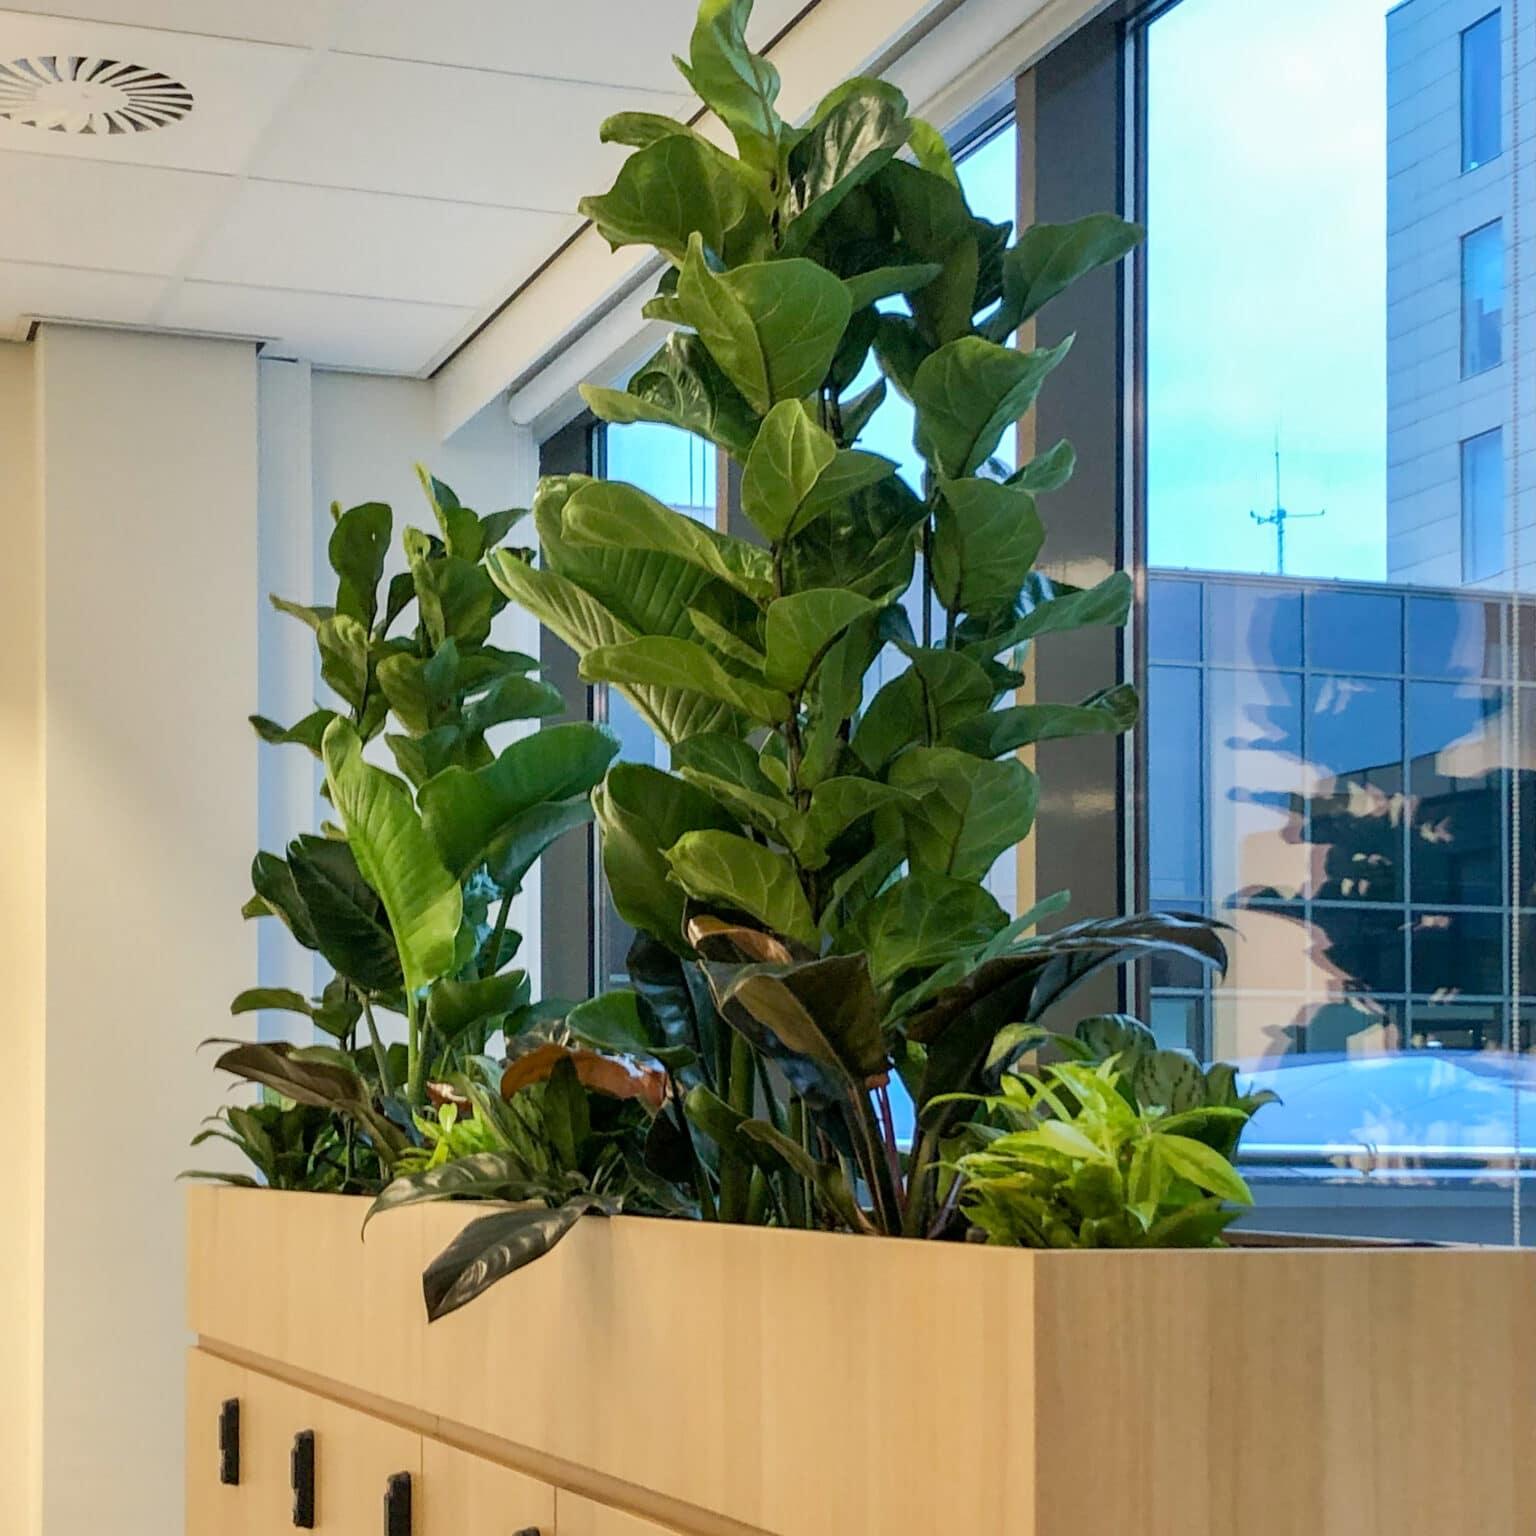 Kantoorbeplanting bij Link Asset Services